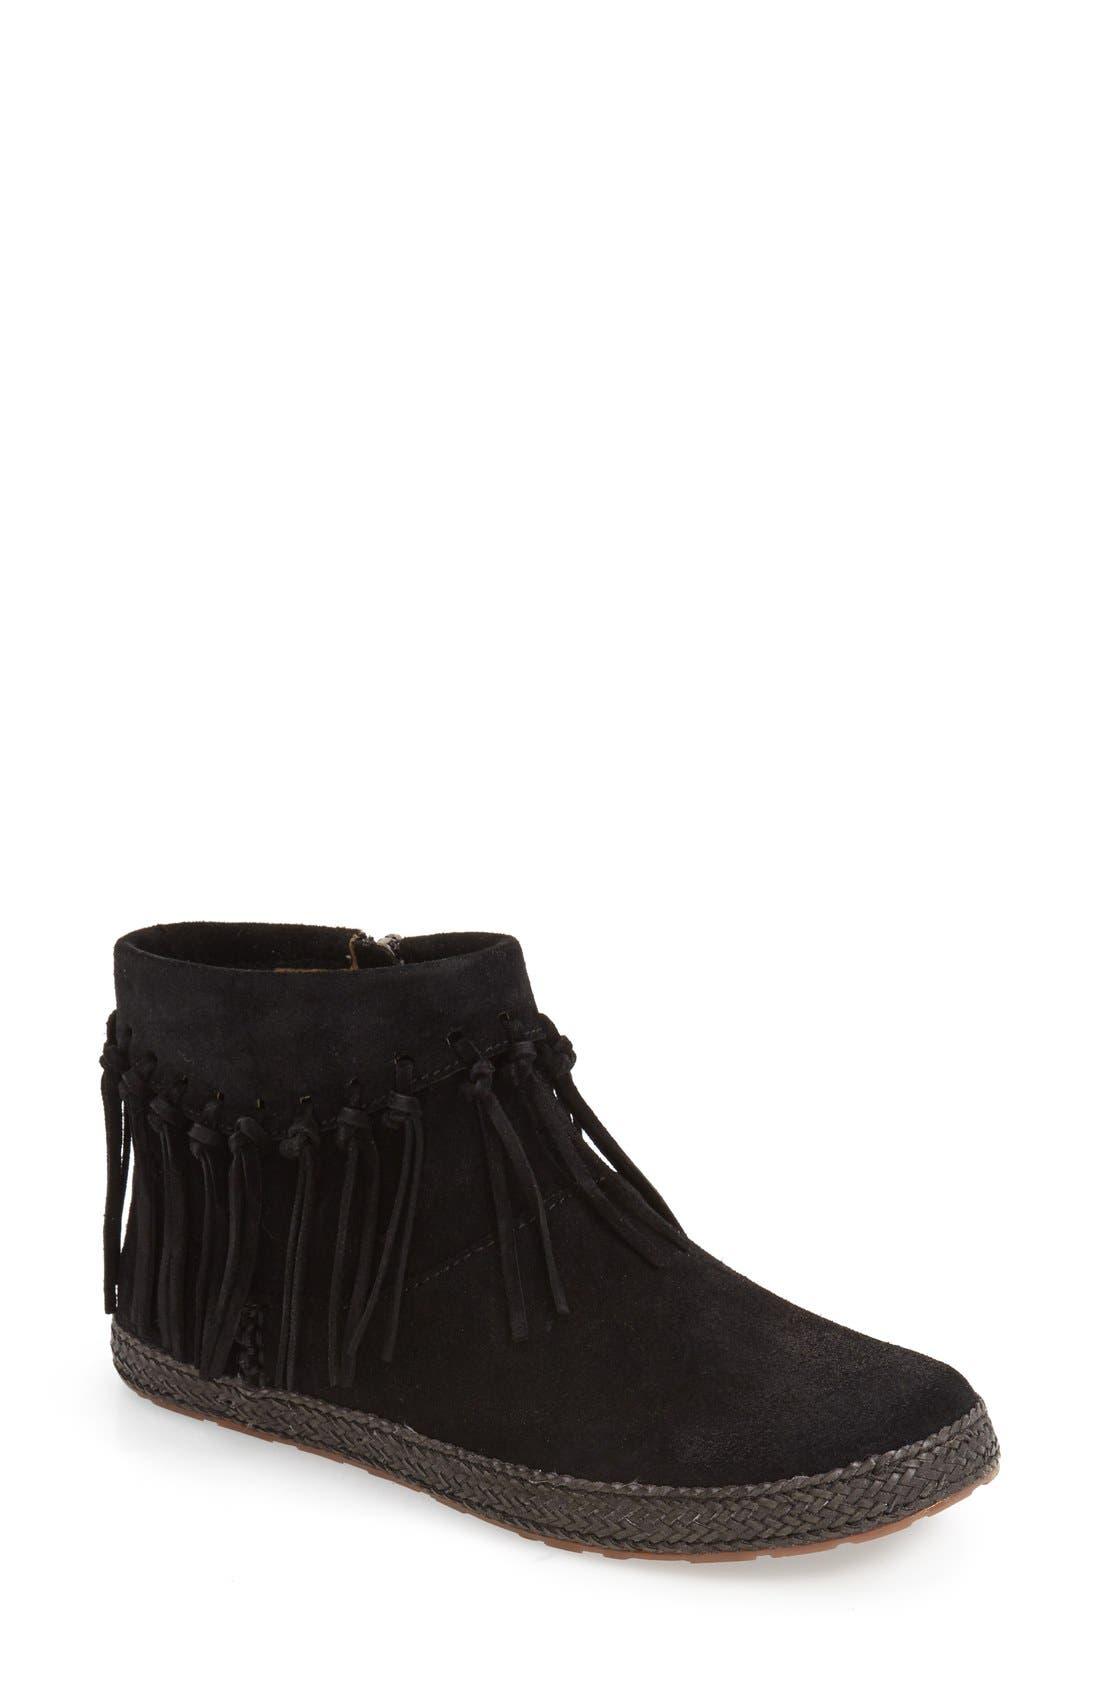 Alternate Image 1 Selected - UGG® 'Shenendoah' Fringe Ankle Boot (Women)